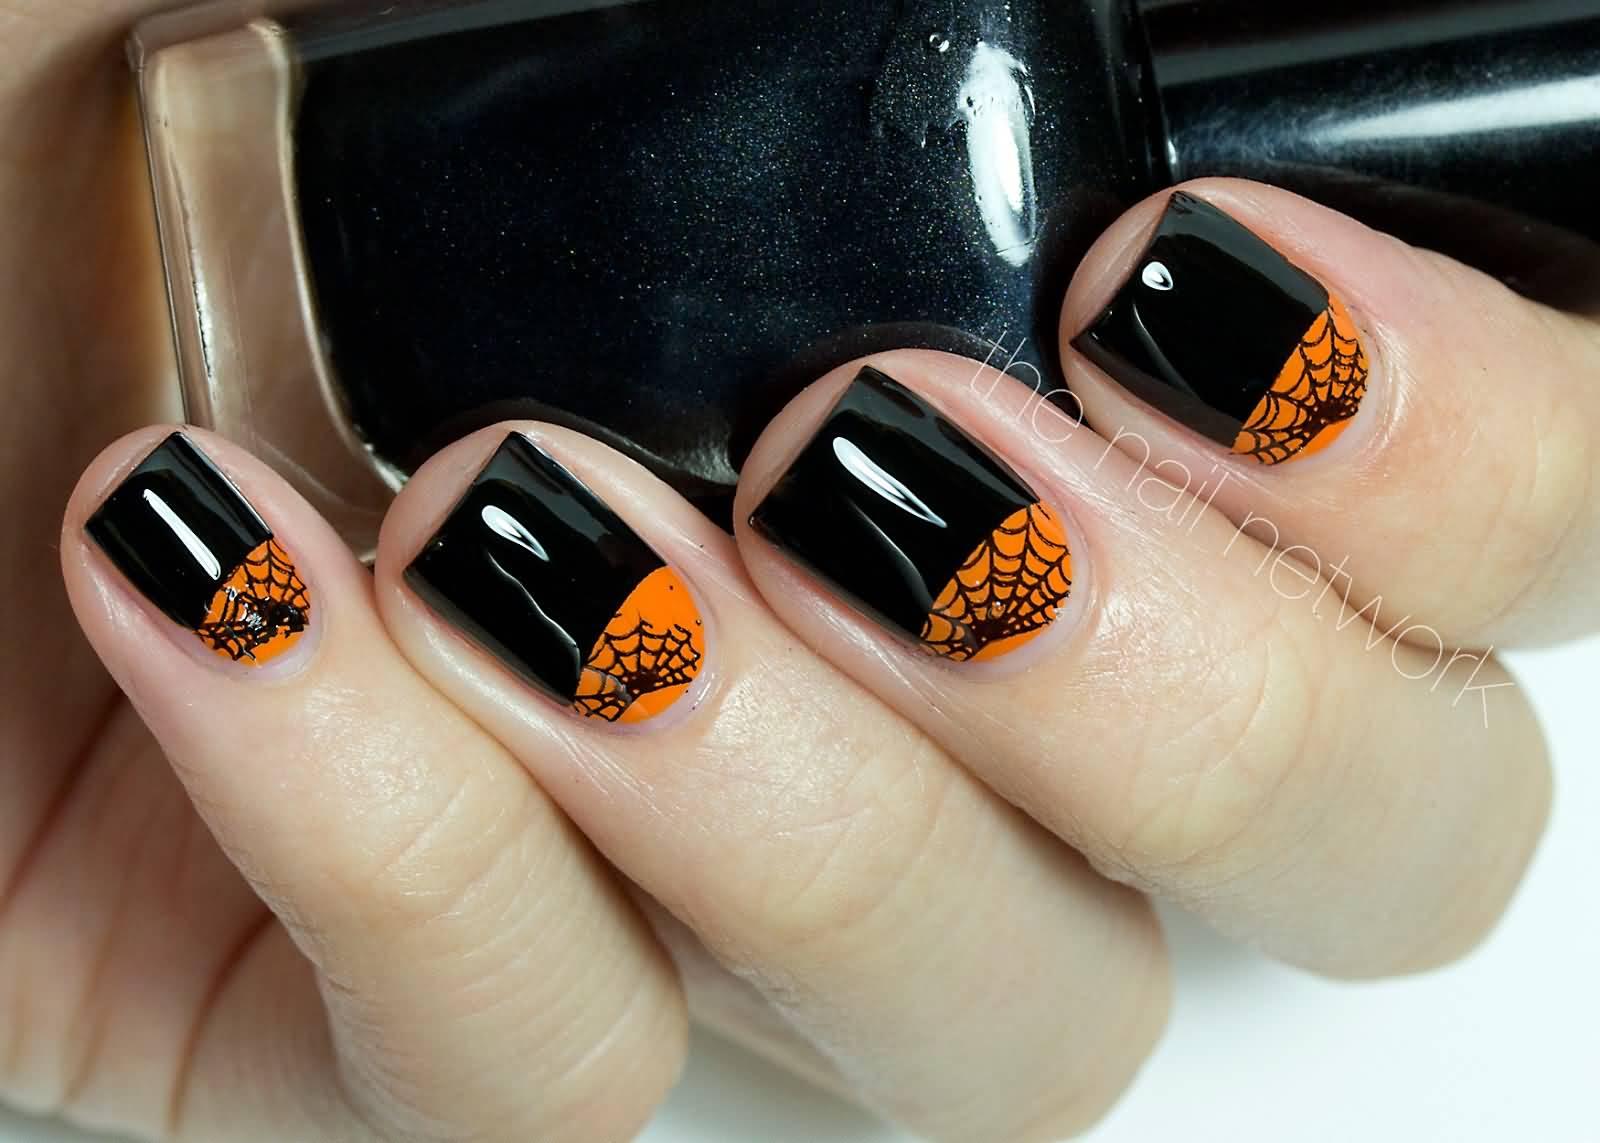 Glossy Black With Orange Spider Web Half Moon Design Nail Art